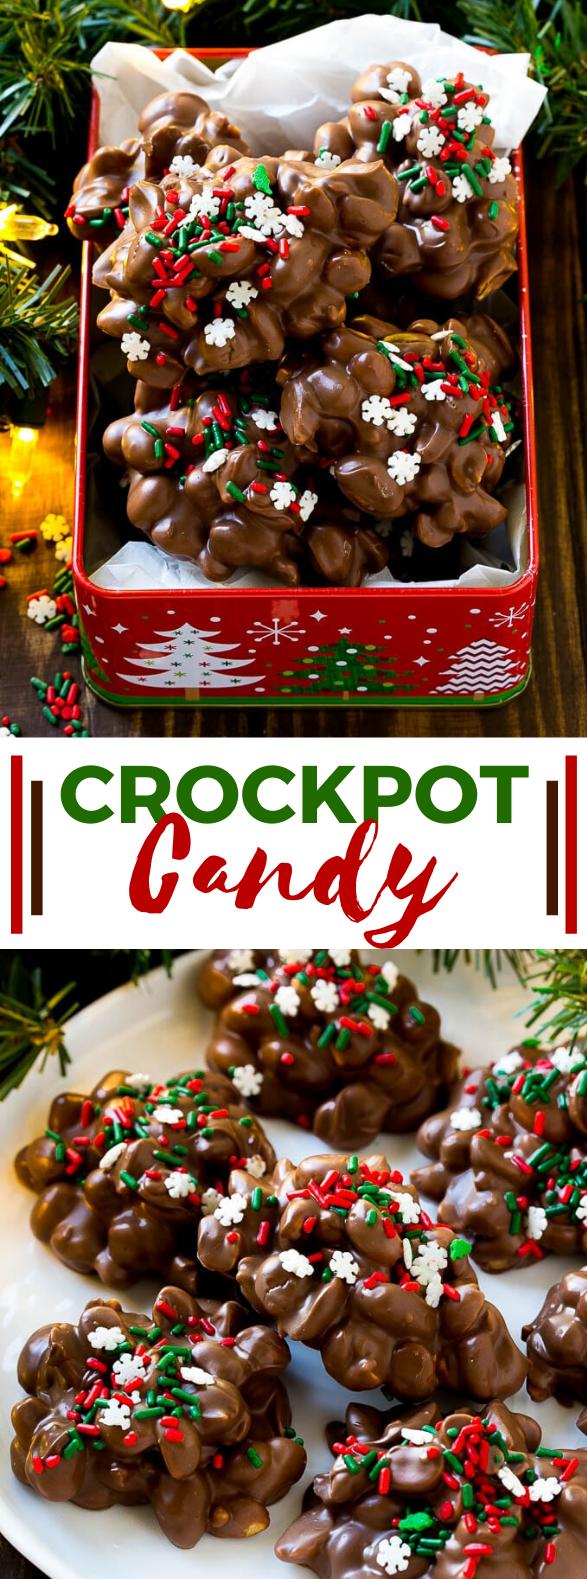 Crock Pot Candy #desserts #christmas